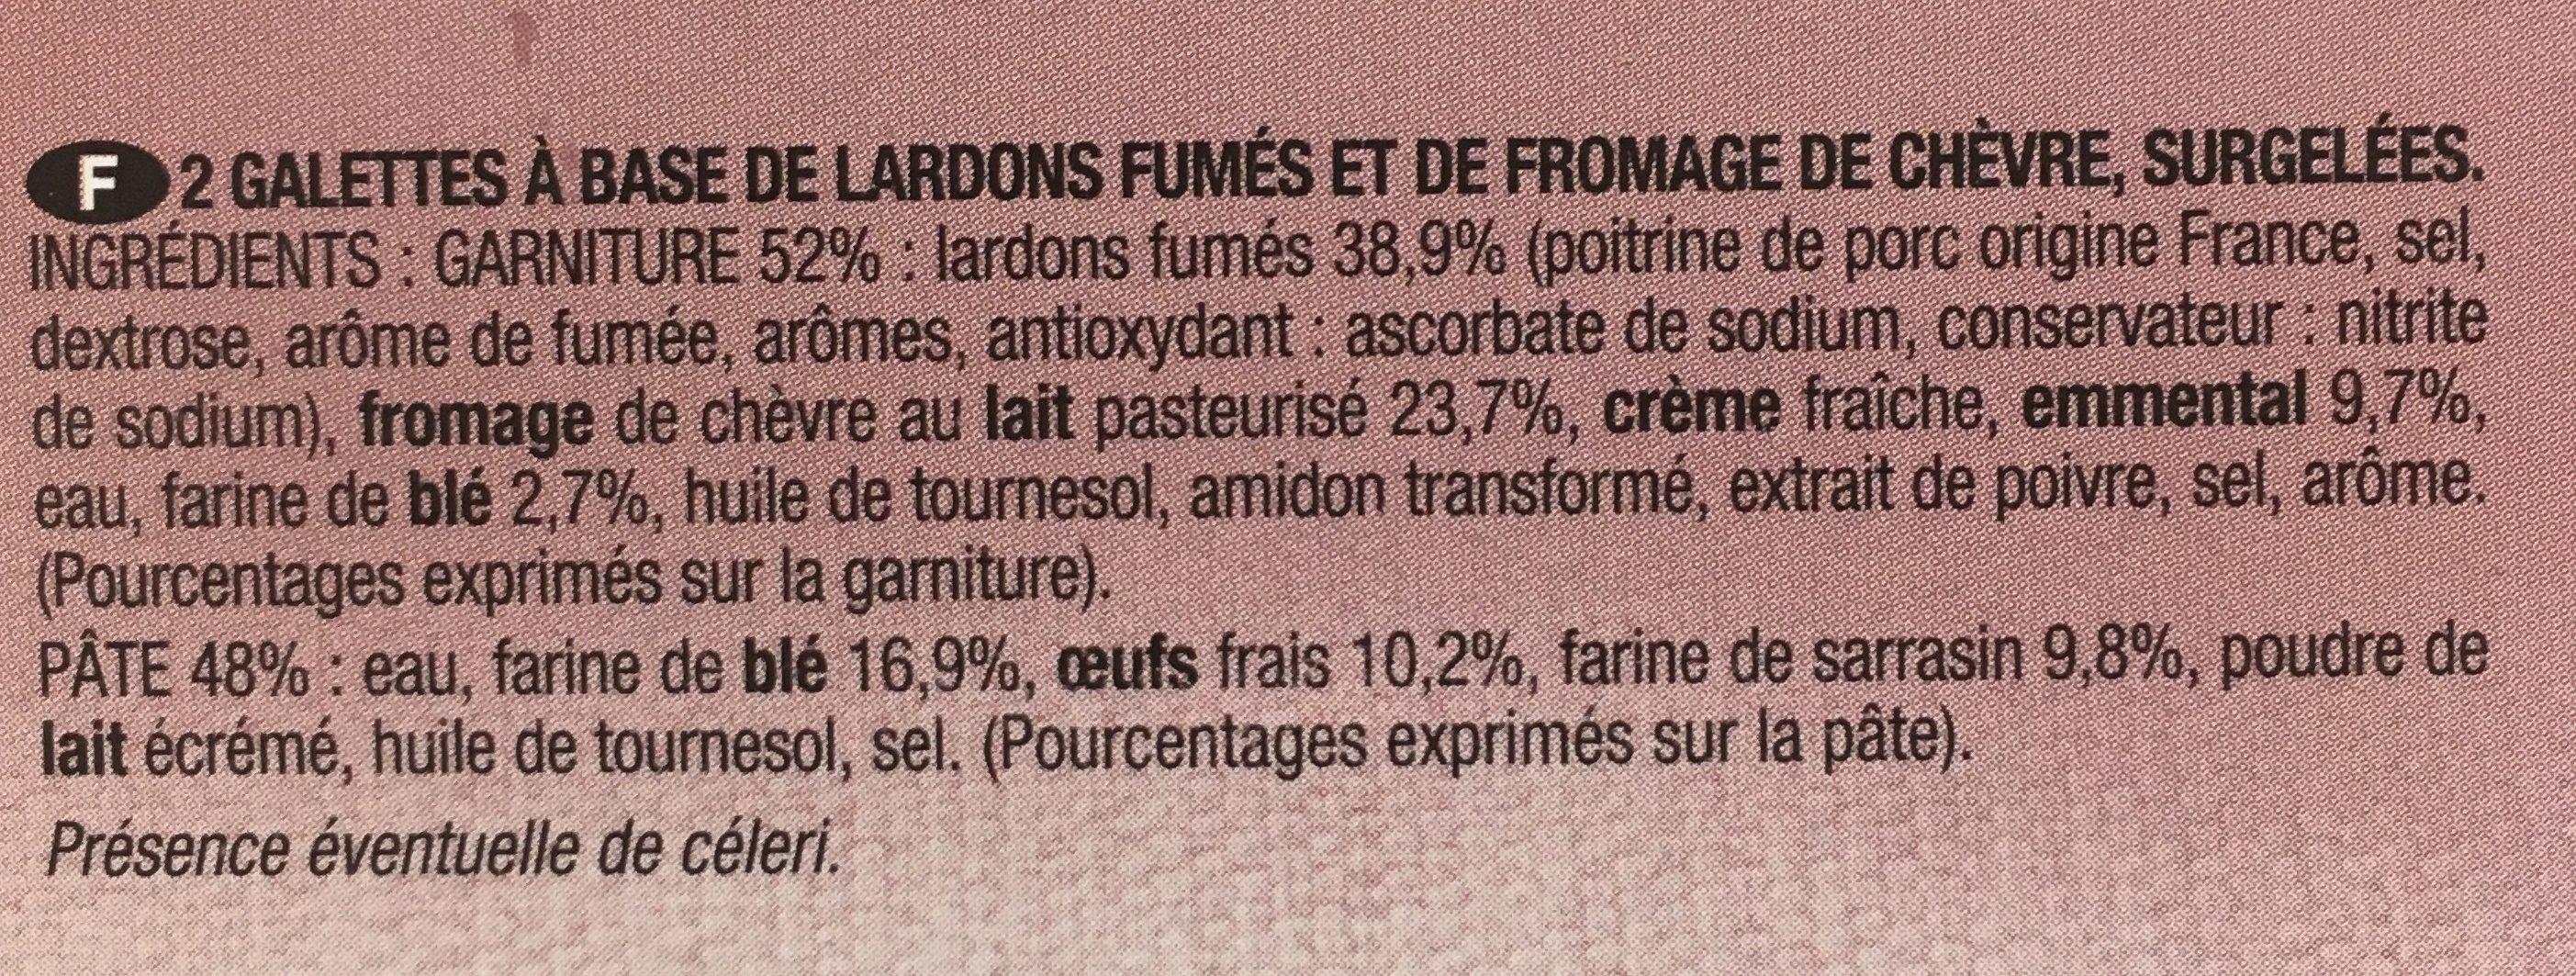 2 galettes lardons chèvre - Ingredients - fr